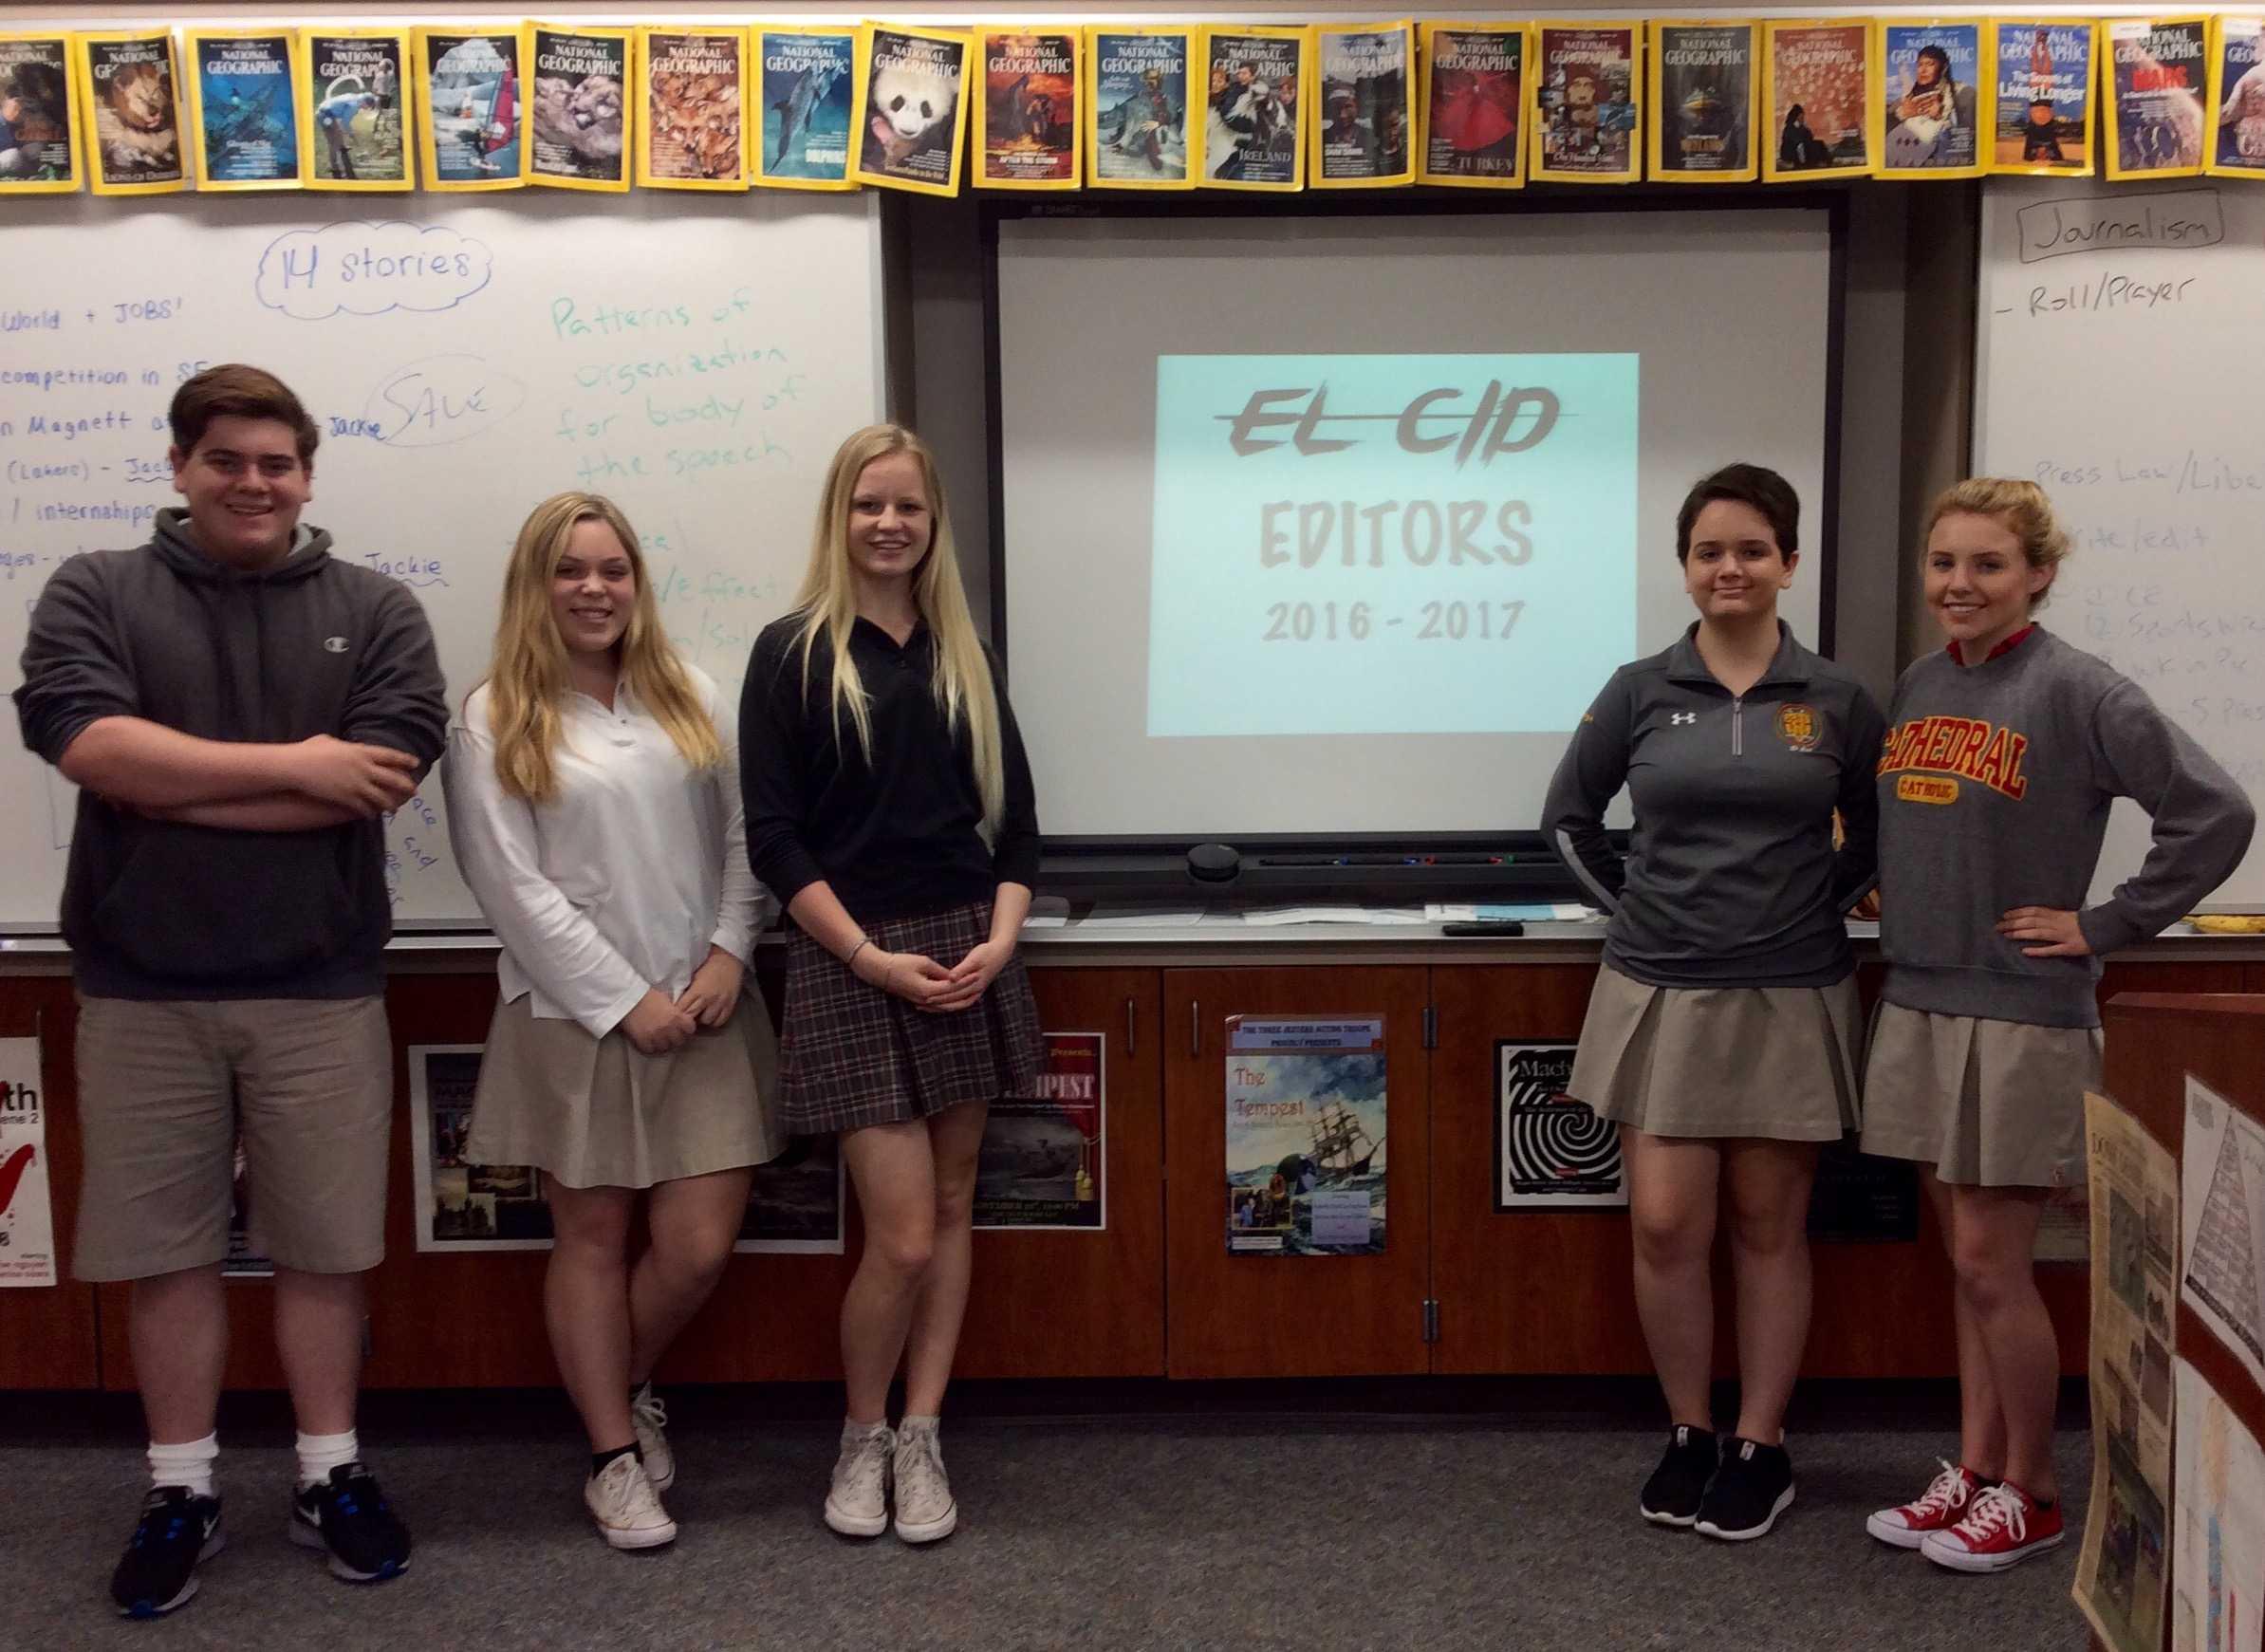 Left to right: Matthew Bailey '17, Sydney Calhoun '17, Kelsey Bacinett '17, Lauryn Sanchez '17, LeeAnne Bates '17.